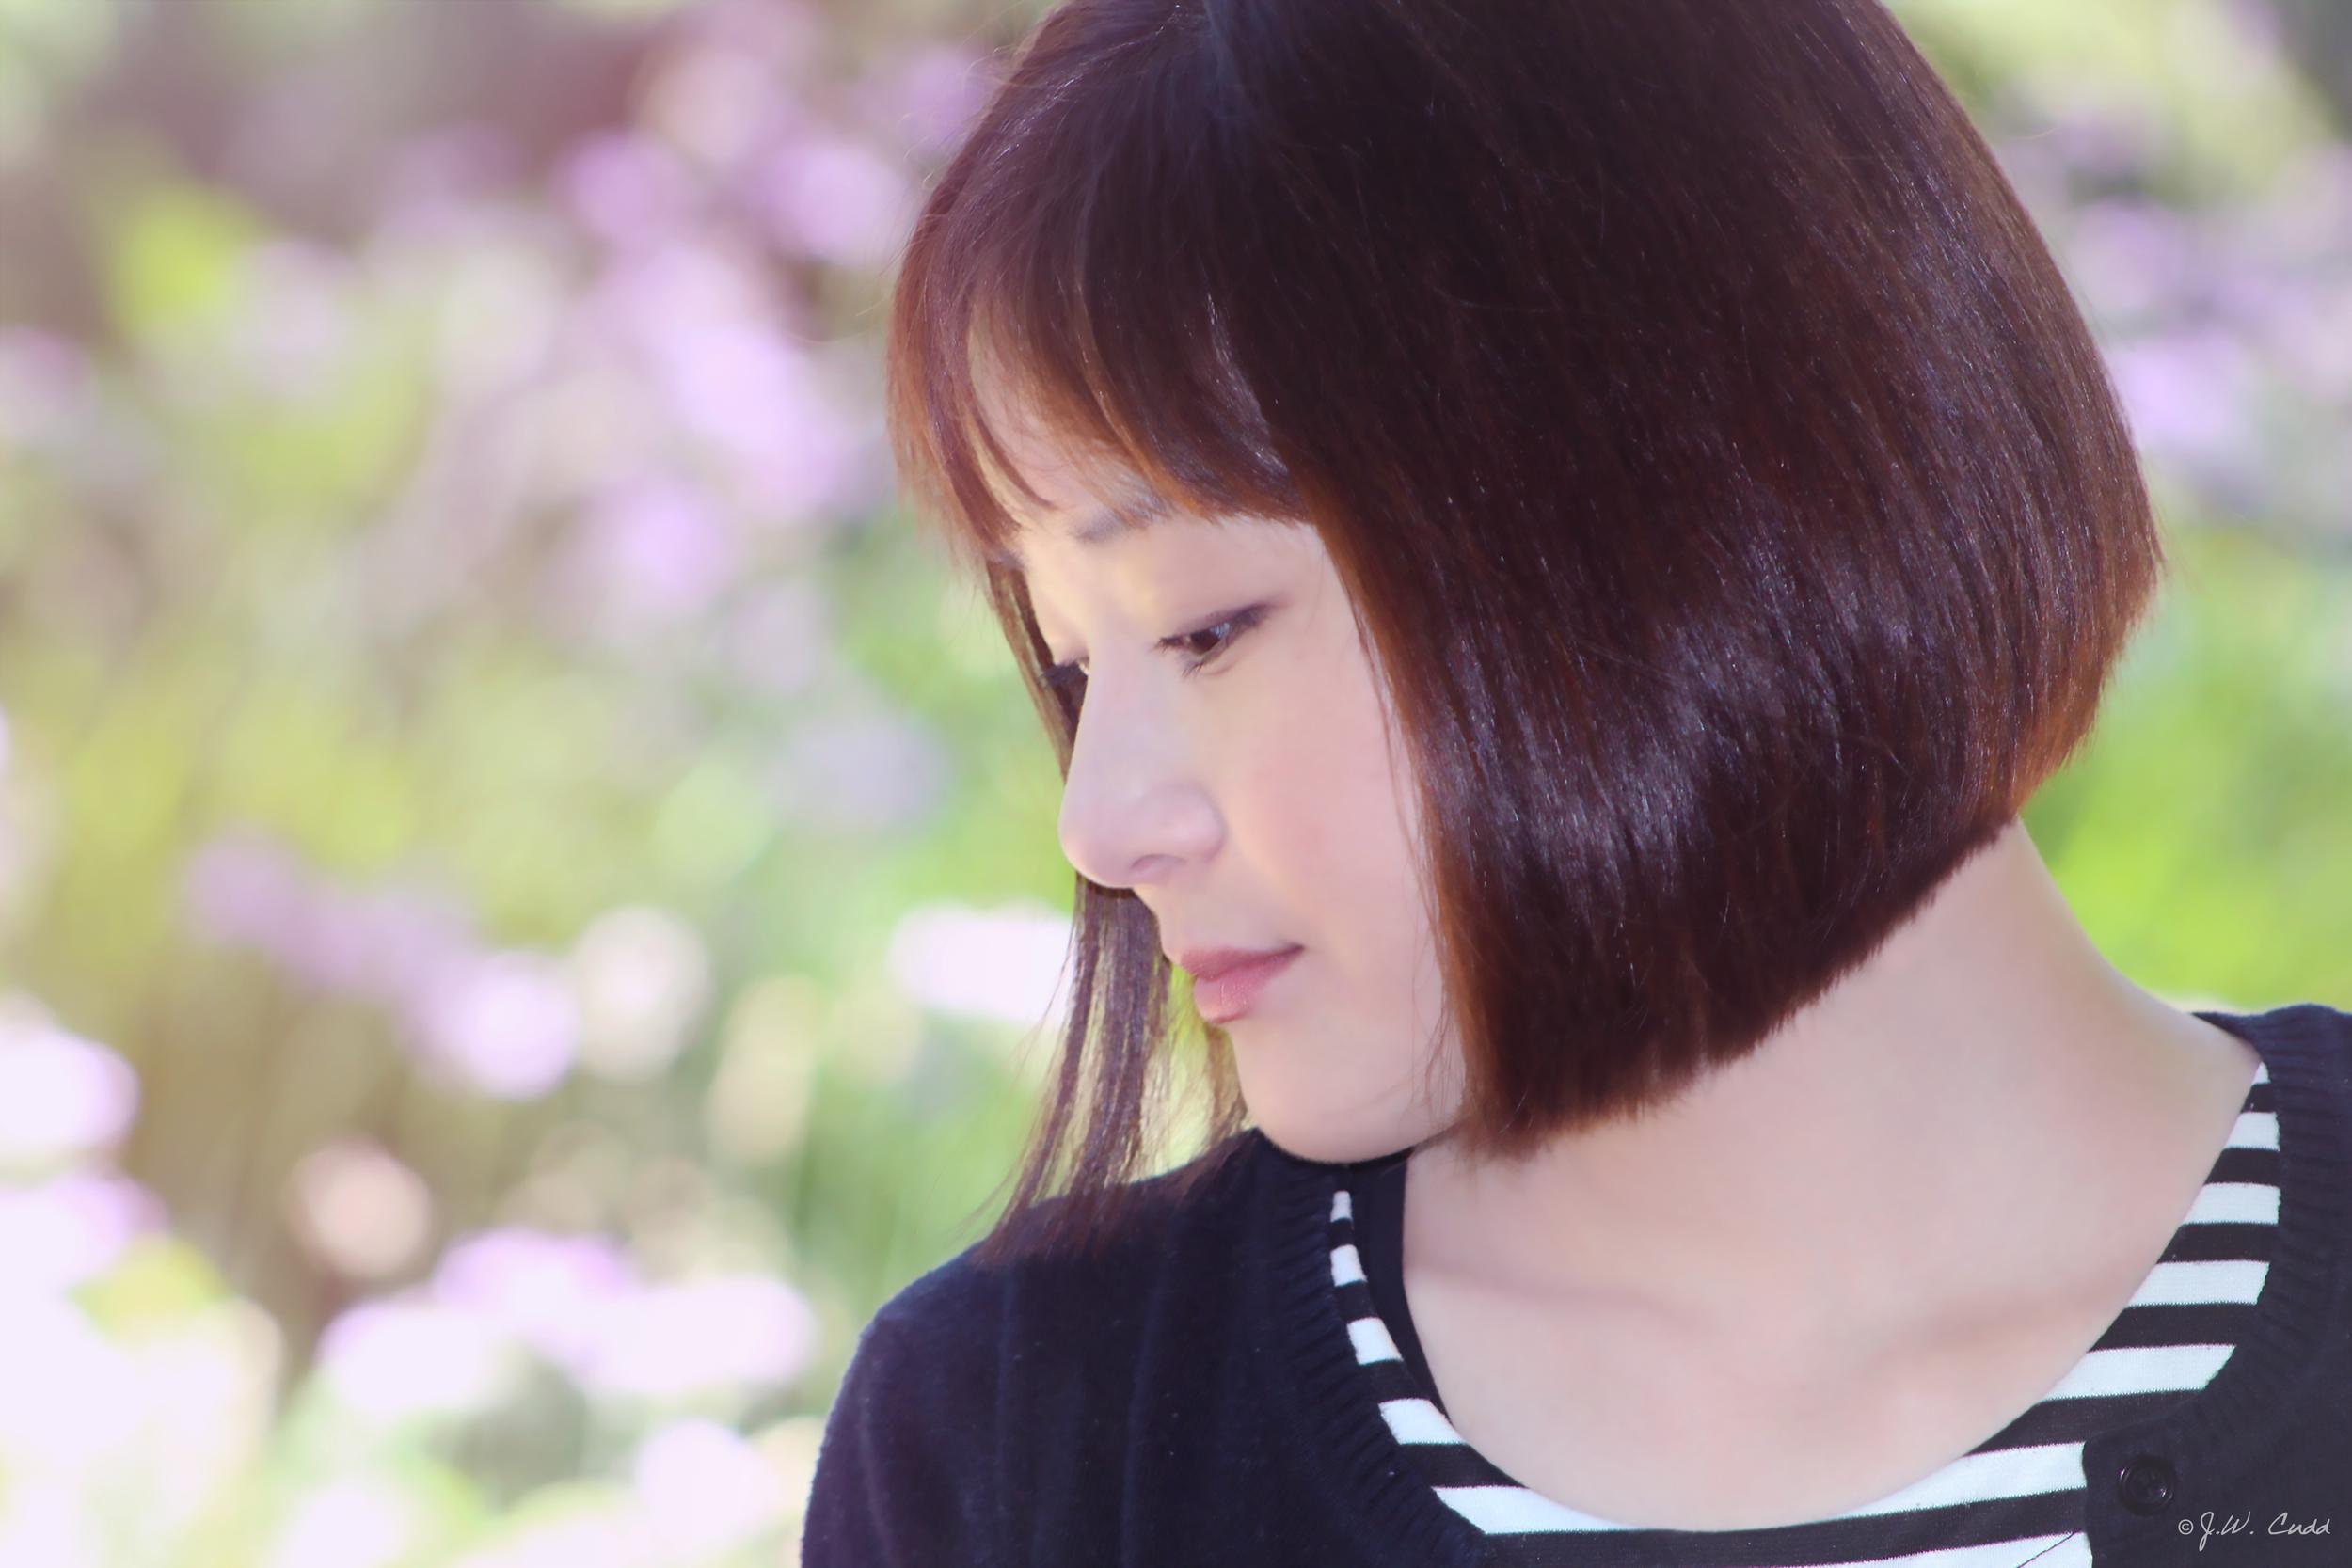 Follow Pamela Chan for more cool stories!    Photographer:   J.W. CUDD